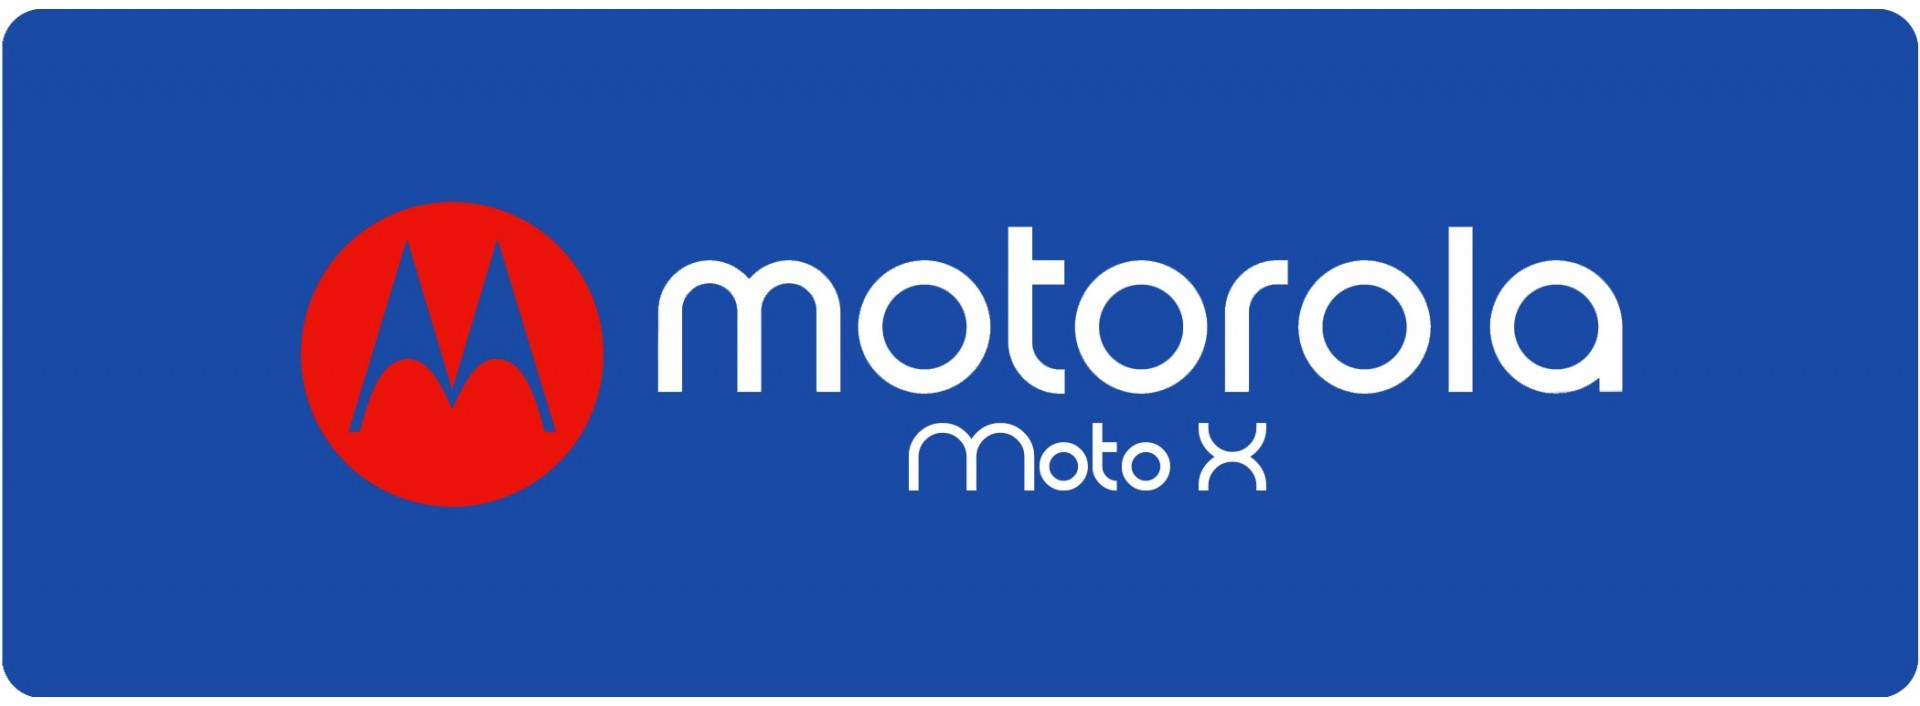 Familia Moto X